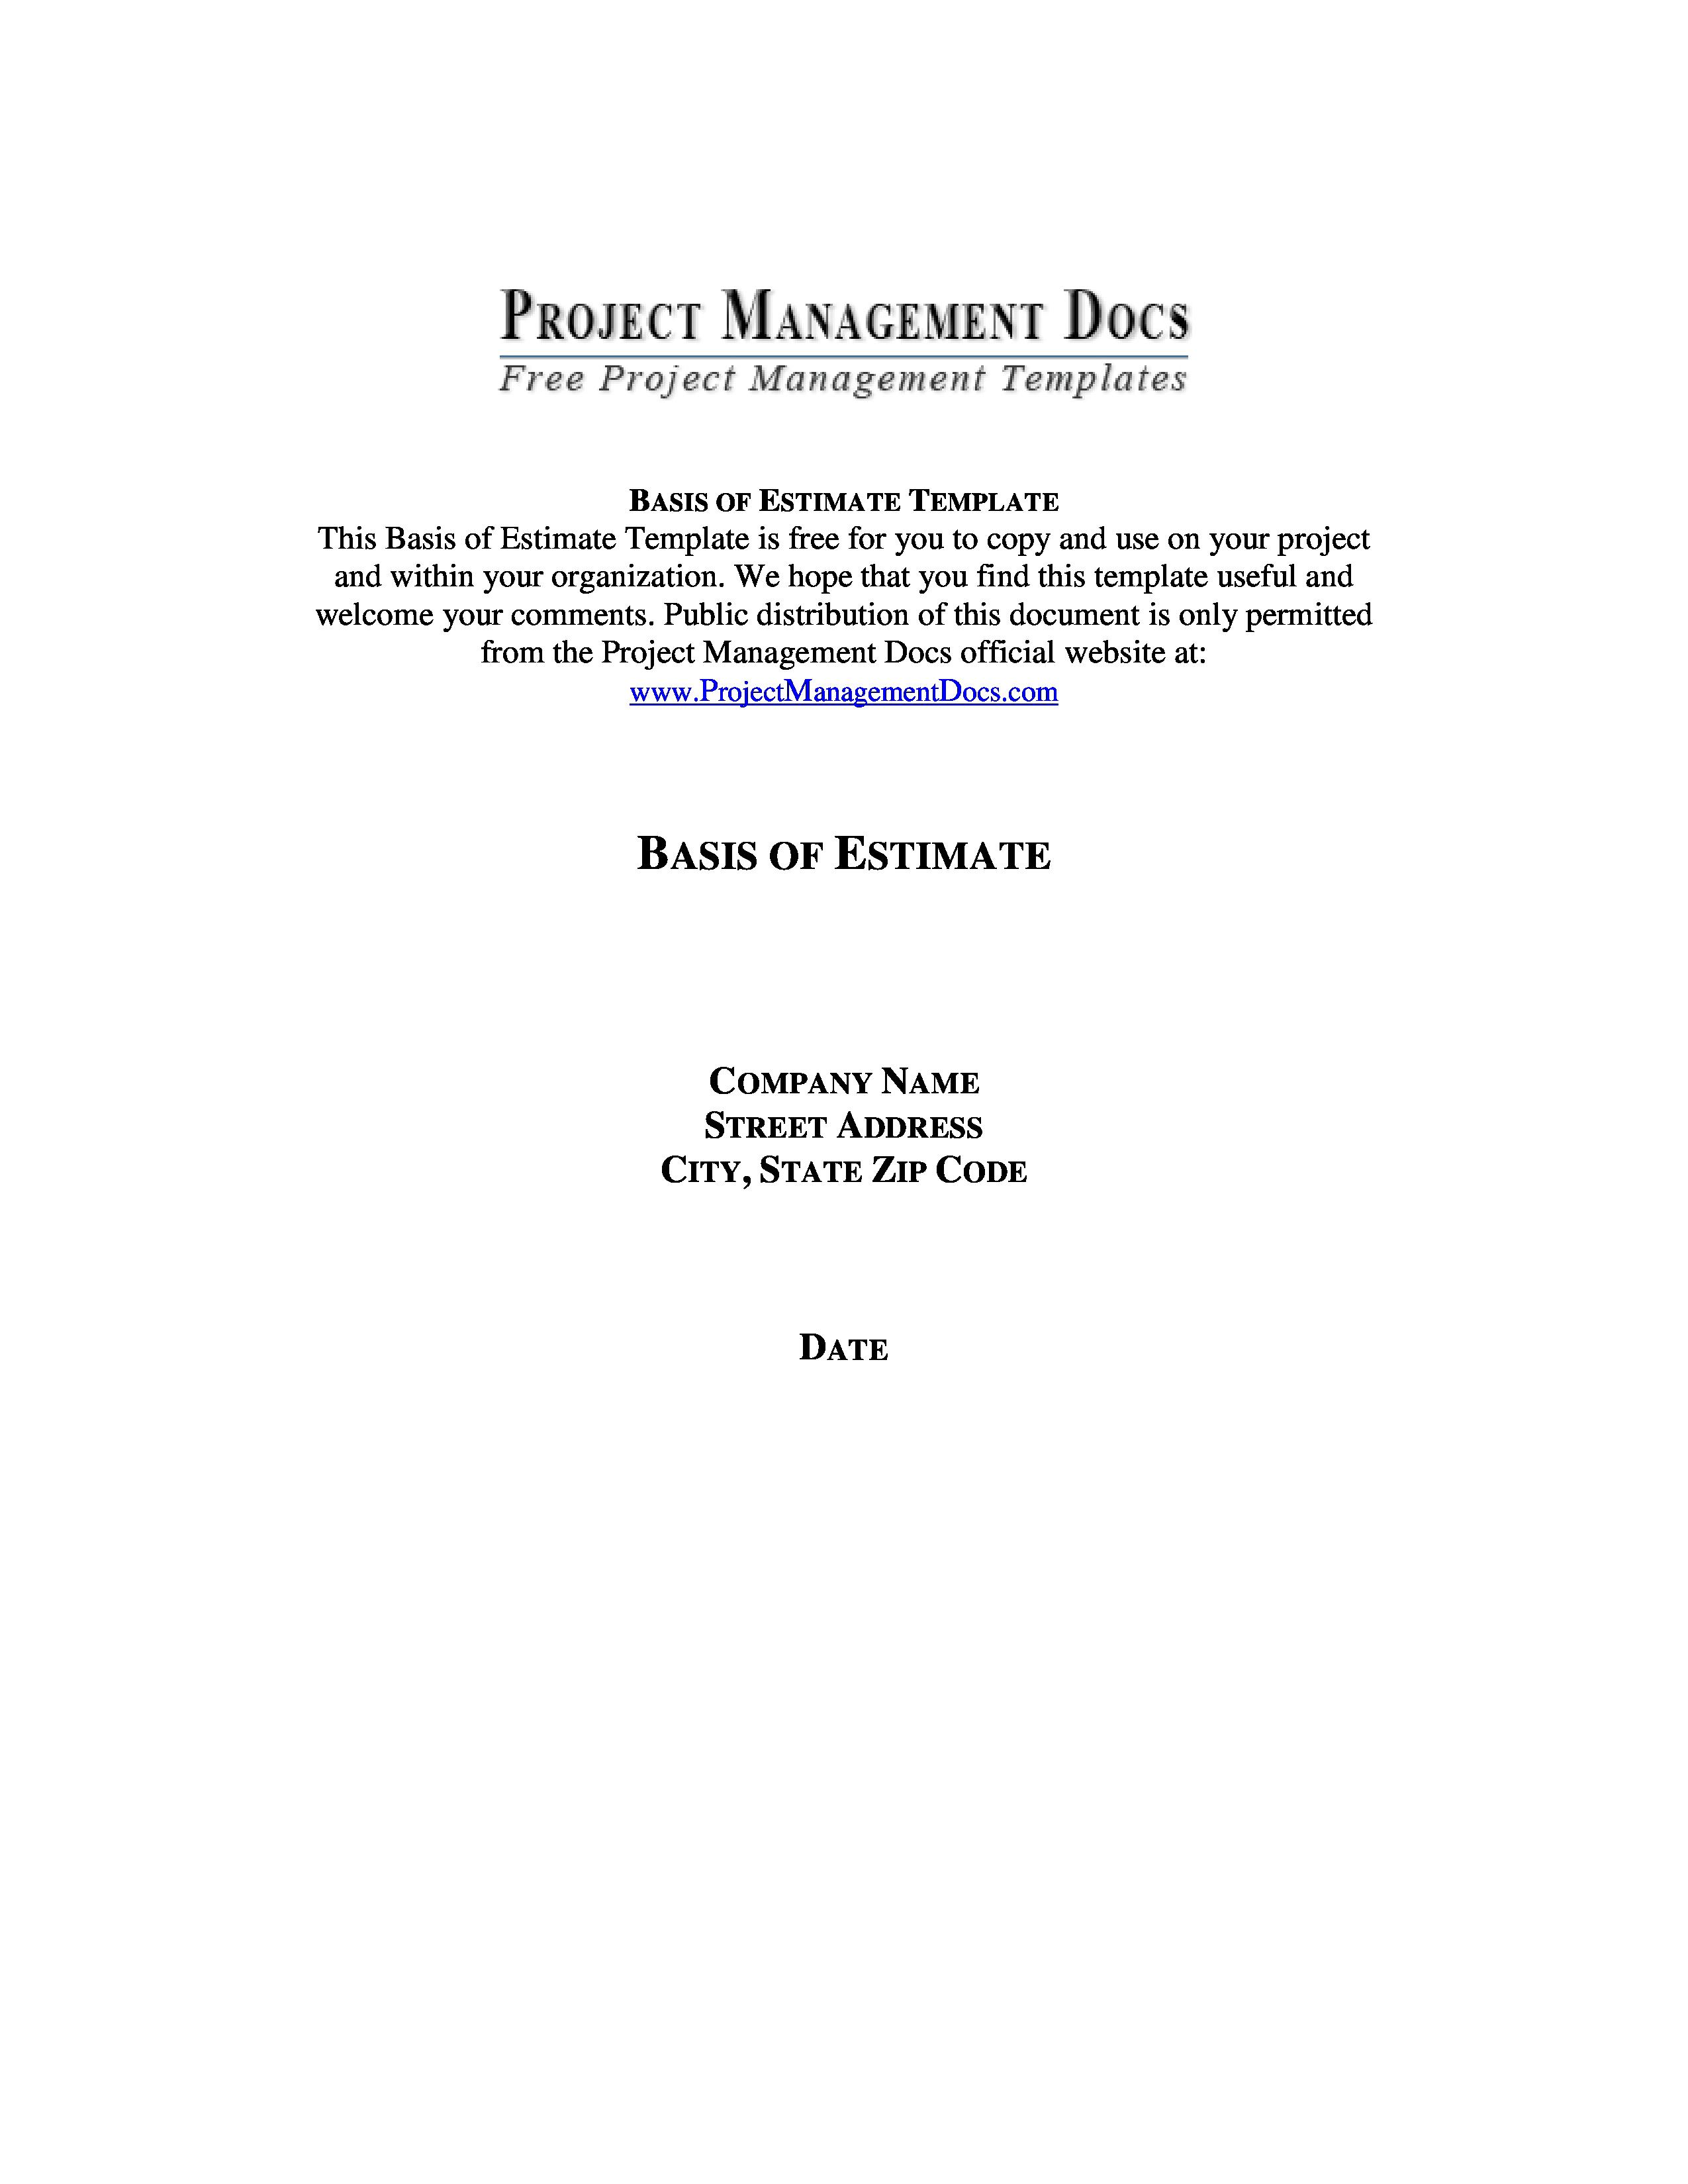 Basis Of Estimate Template